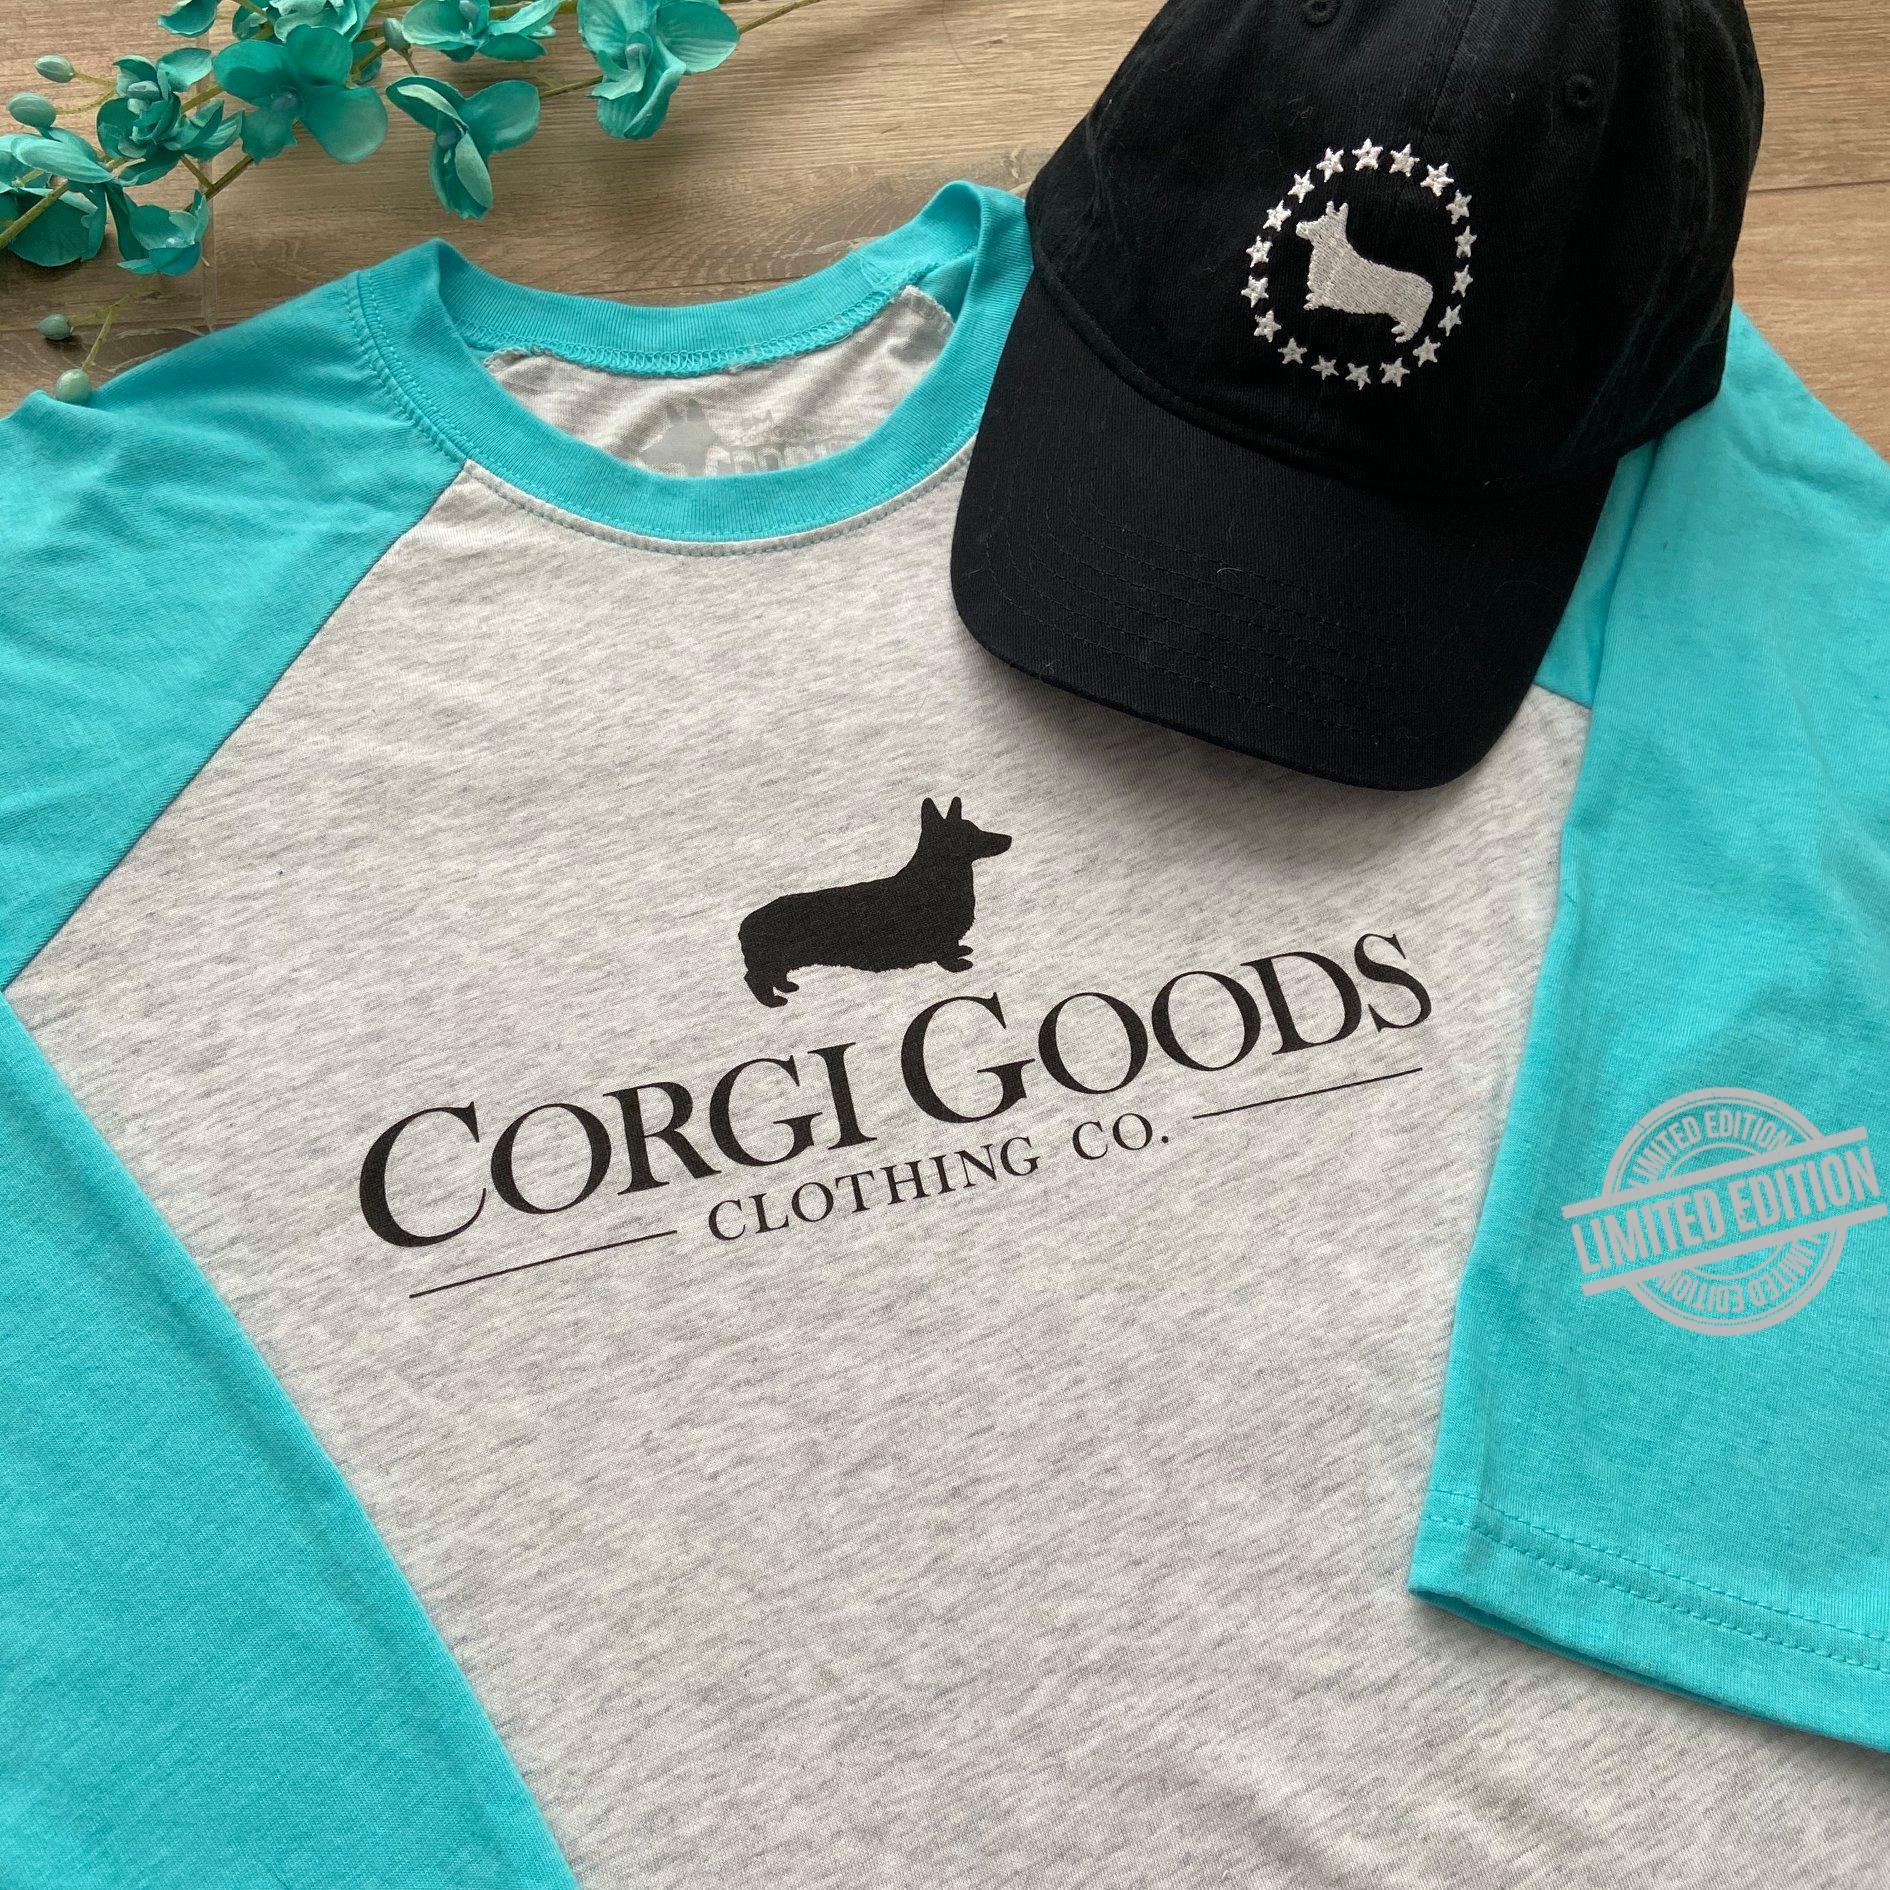 Corgi Goods Clothing Co Shirt